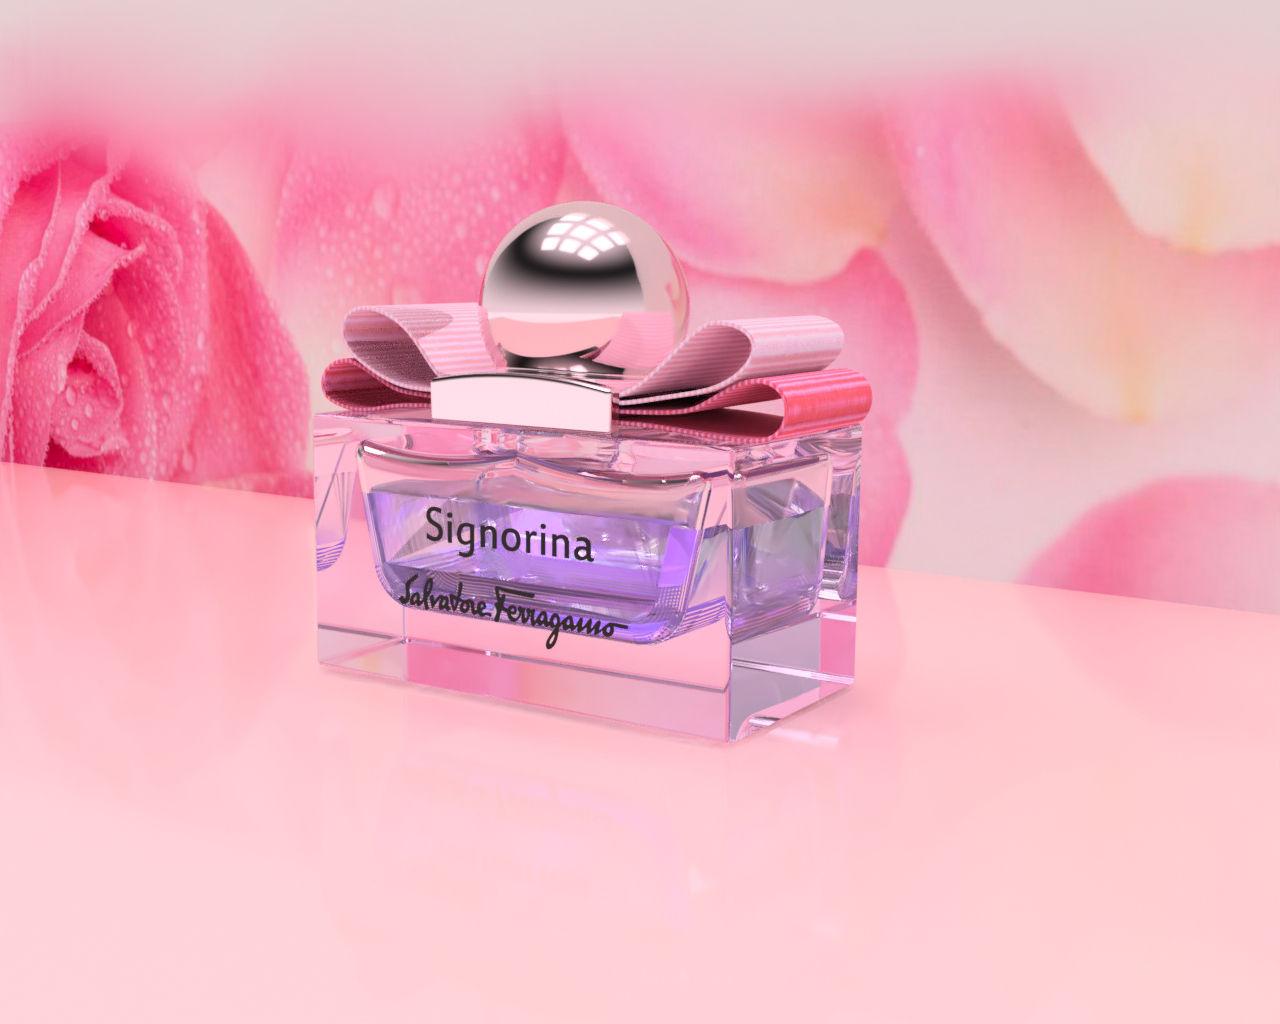 perfume salvatore ferragamo autodesk online gallery. Black Bedroom Furniture Sets. Home Design Ideas